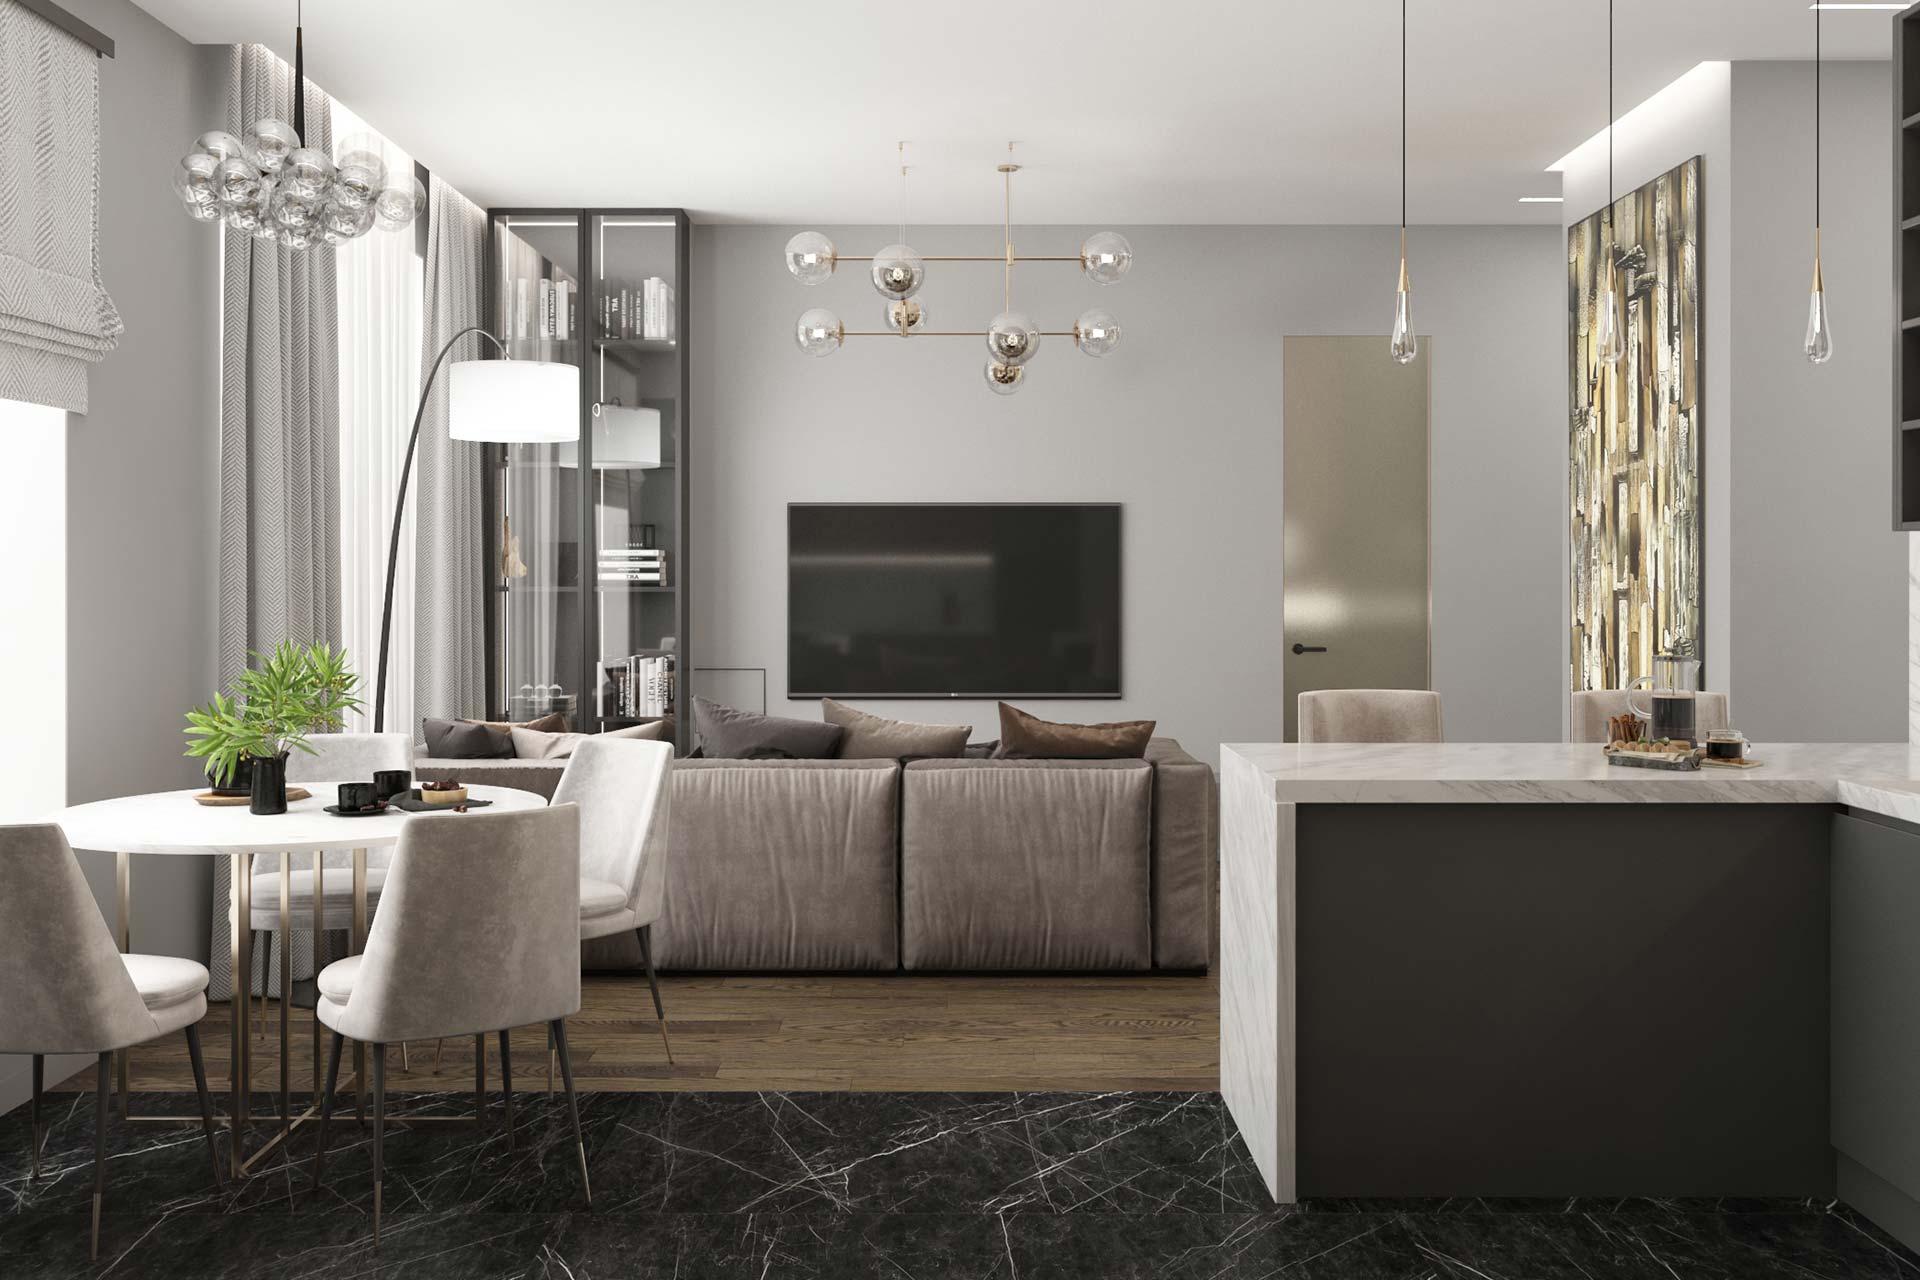 Дизайн 3-комнатной квартиры в ЖК Сити Парк | Дизайн-проект квартиры City Park